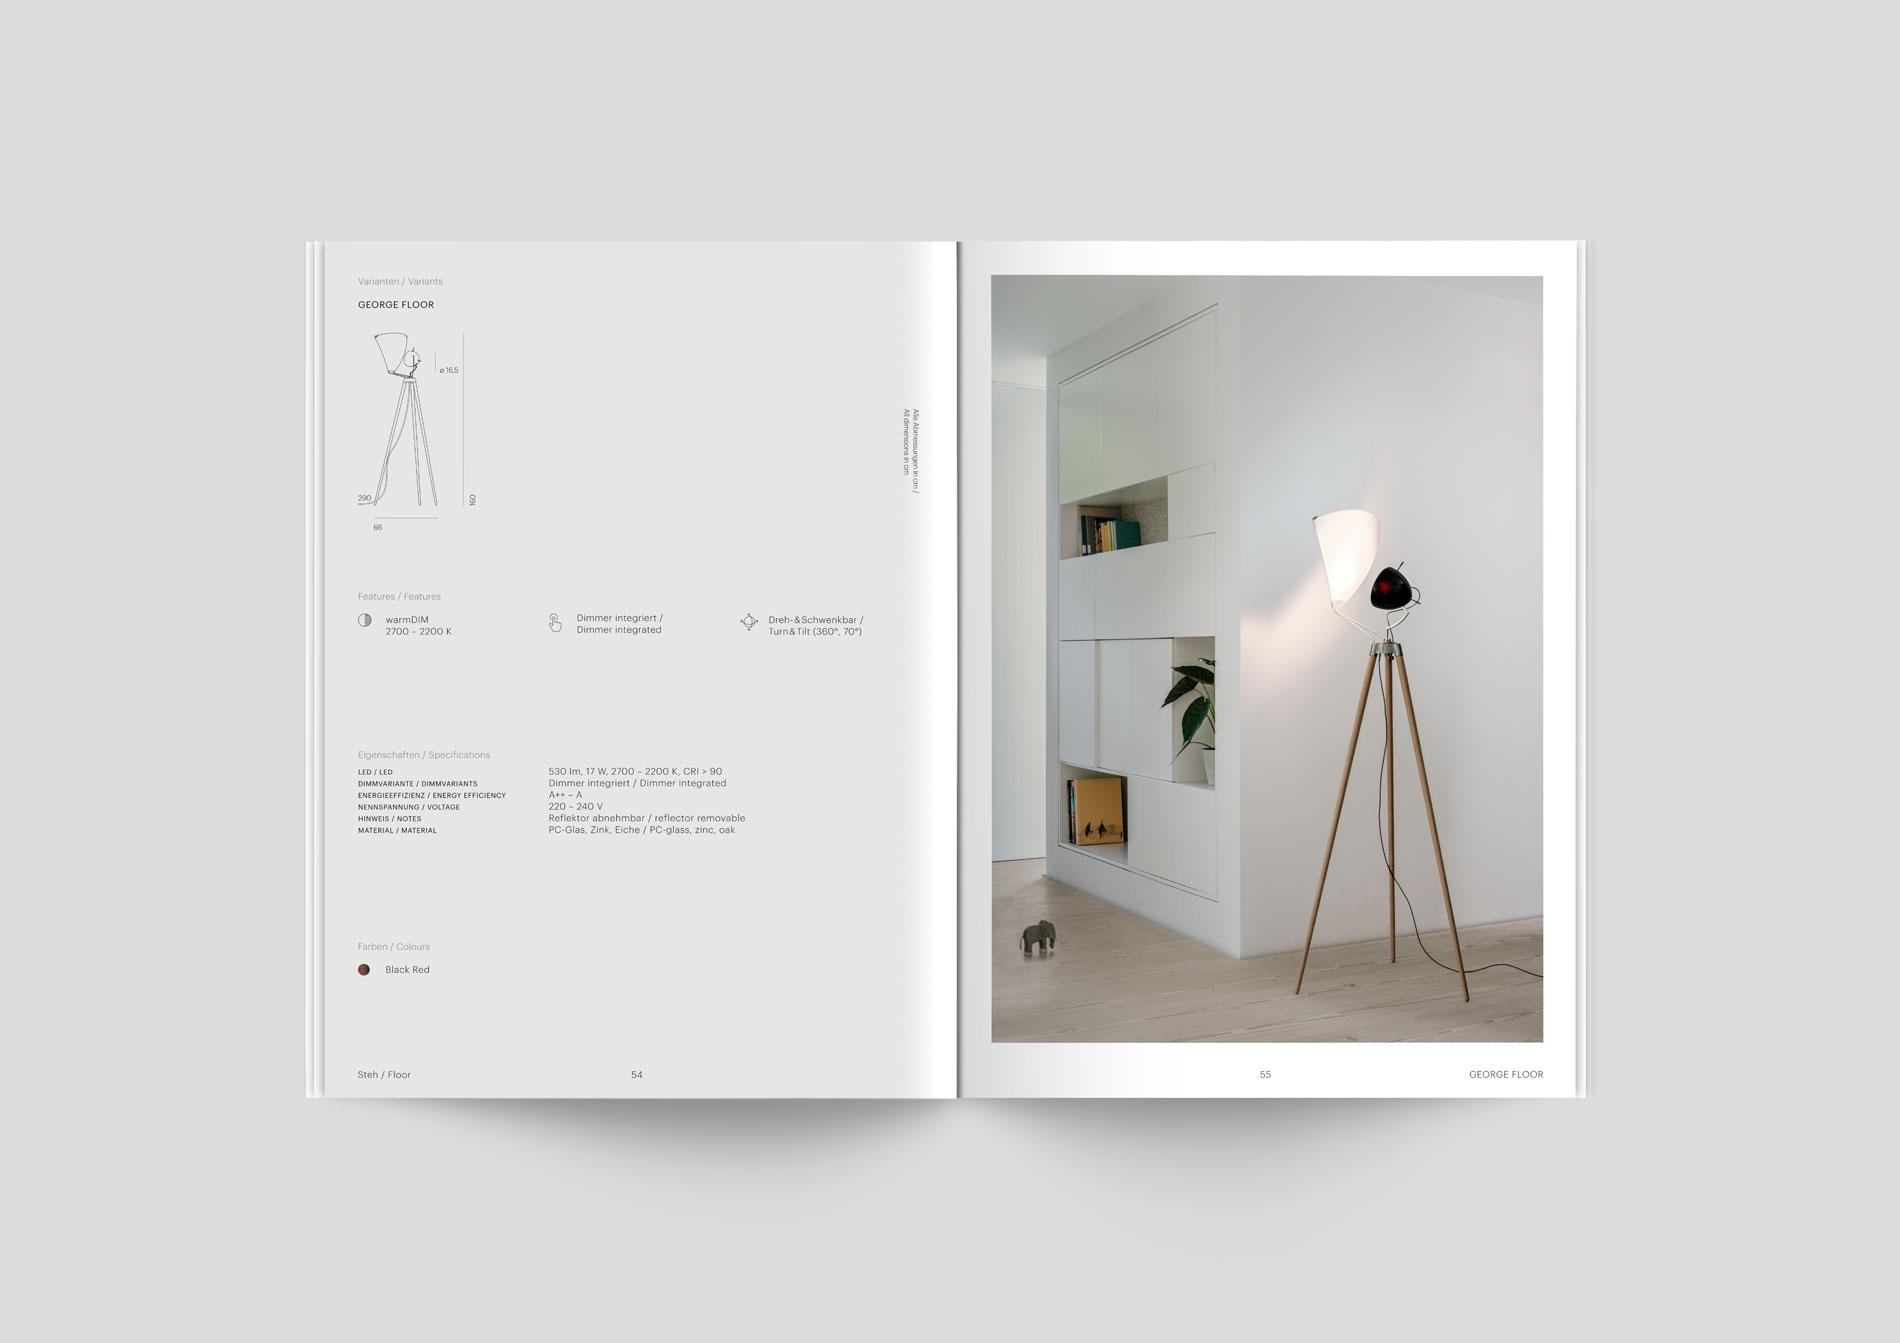 nicoletta-dalfino-tobias-grau-catalogue-2019-07